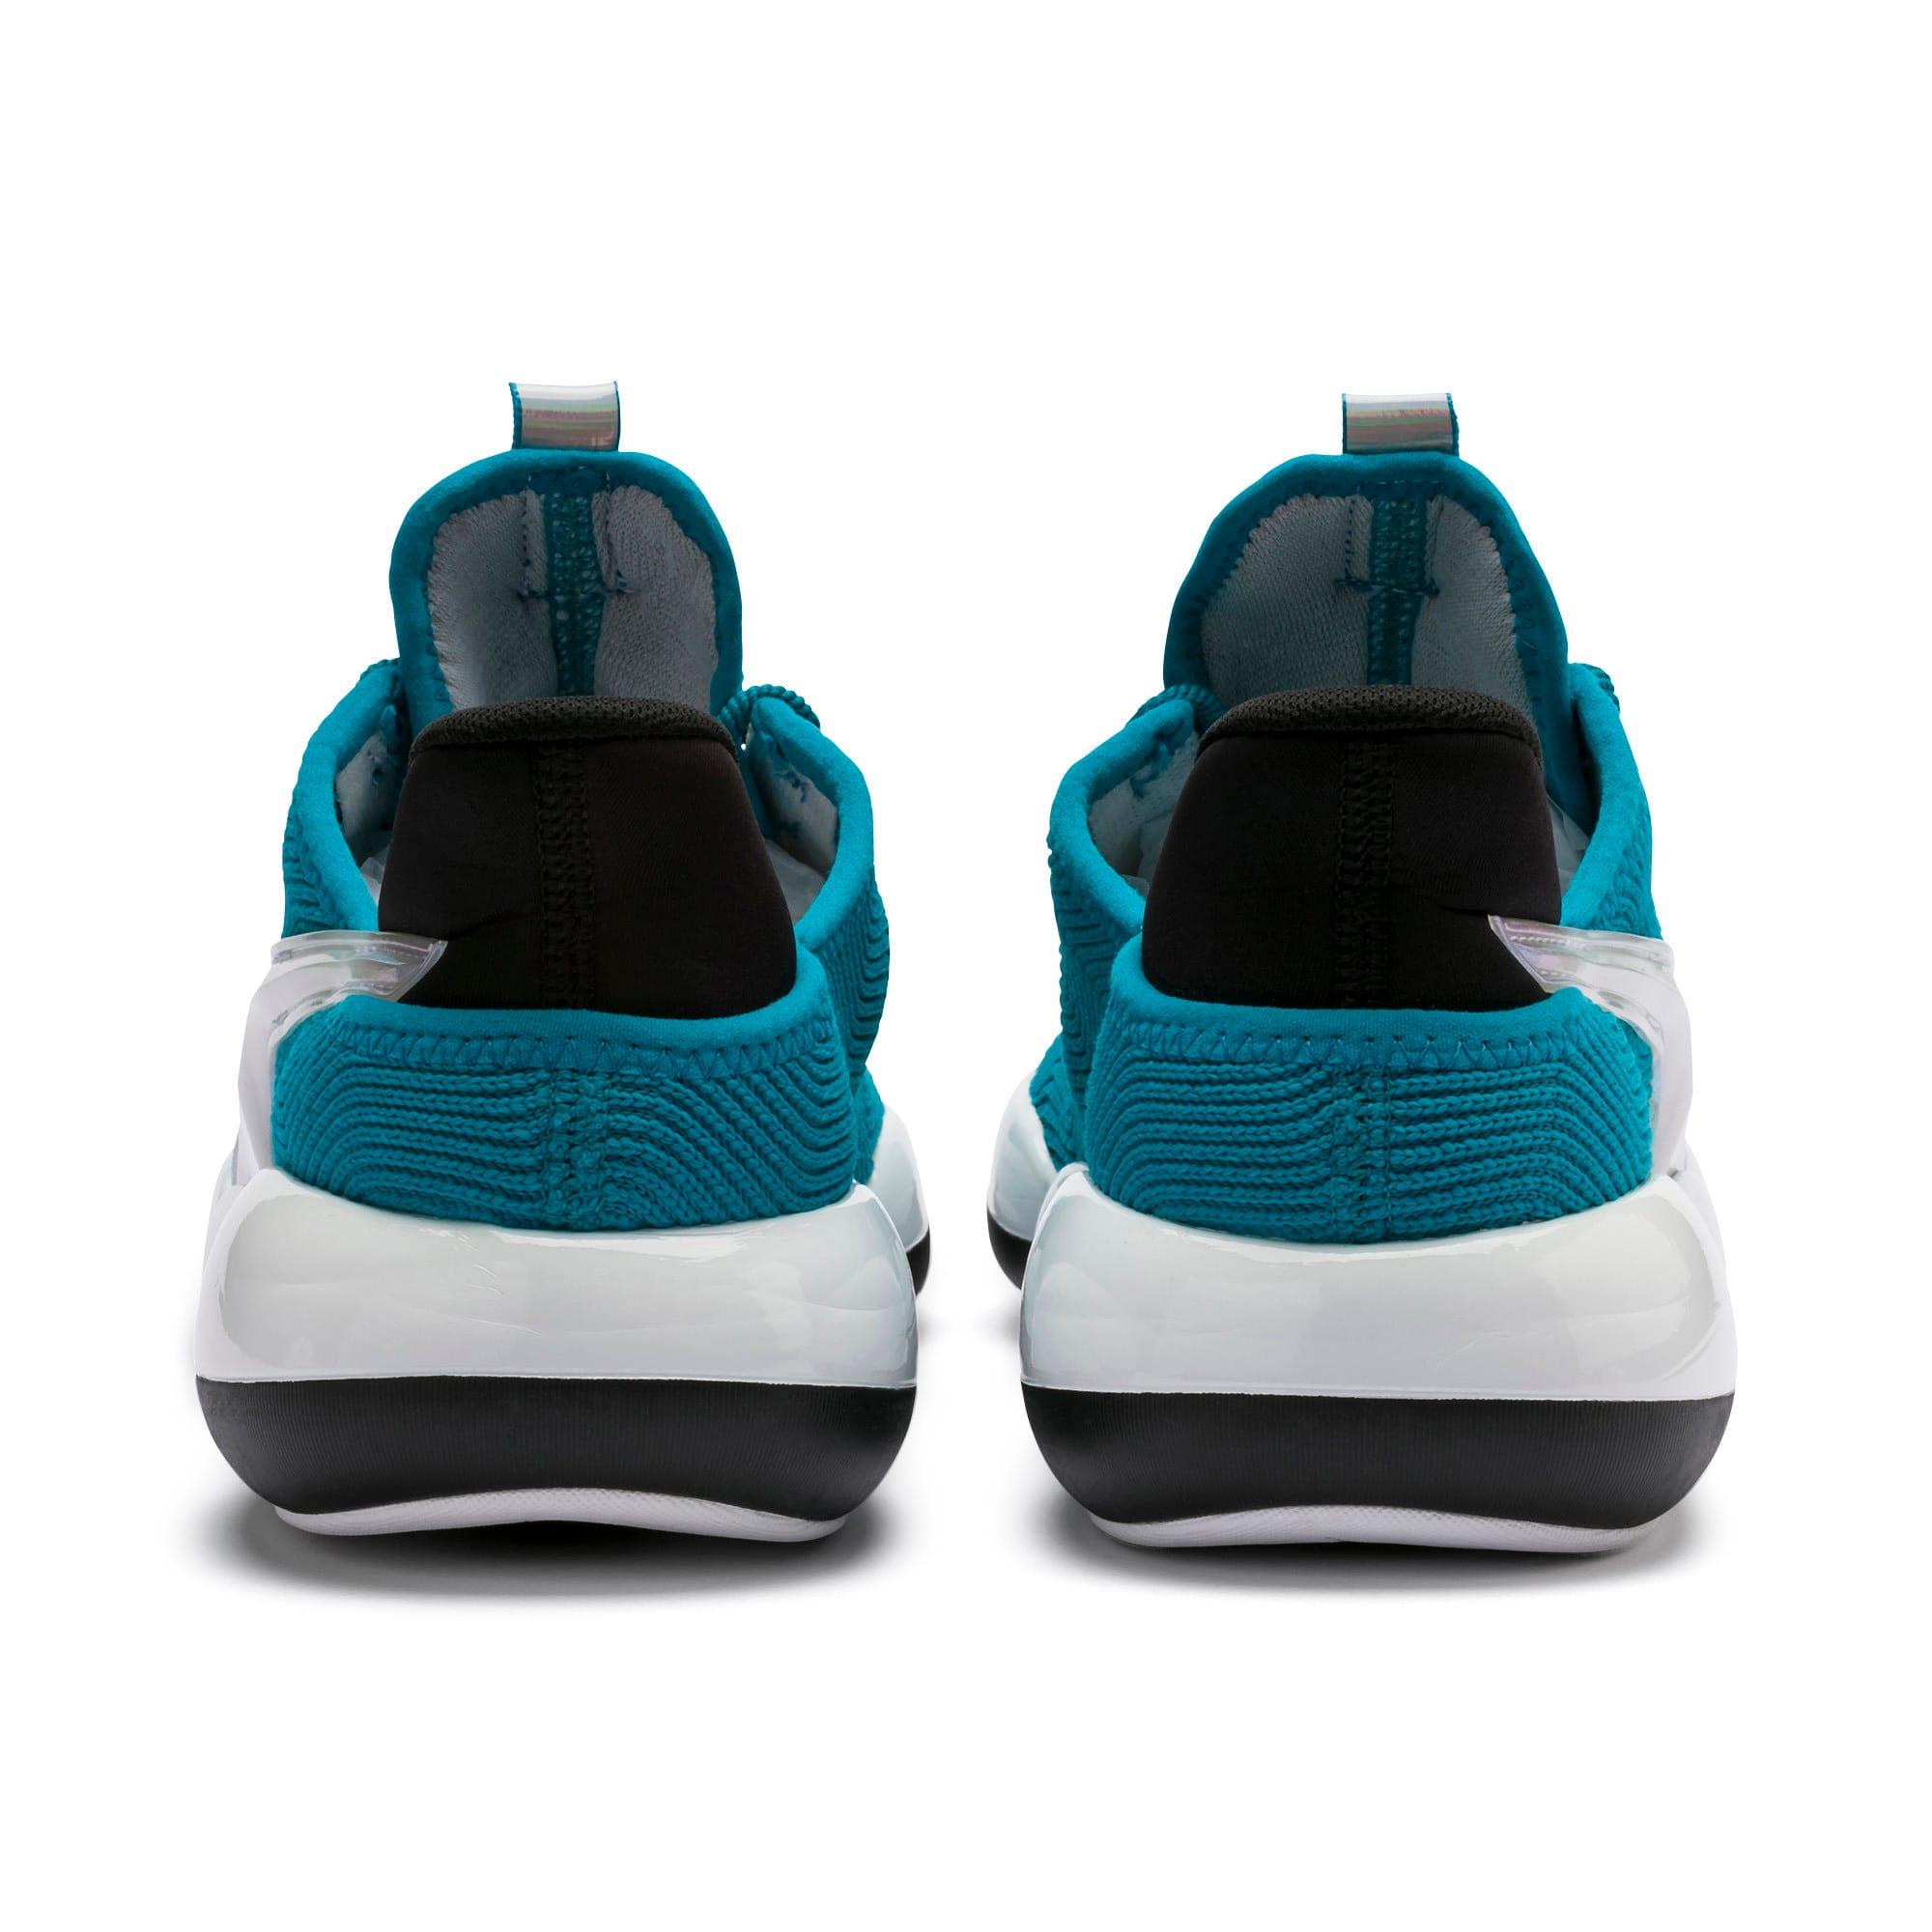 Thumbnail 4 of Mode XT Trailblazer Iridescent Women's Training Shoes, Caribbean Sea-Puma White, medium